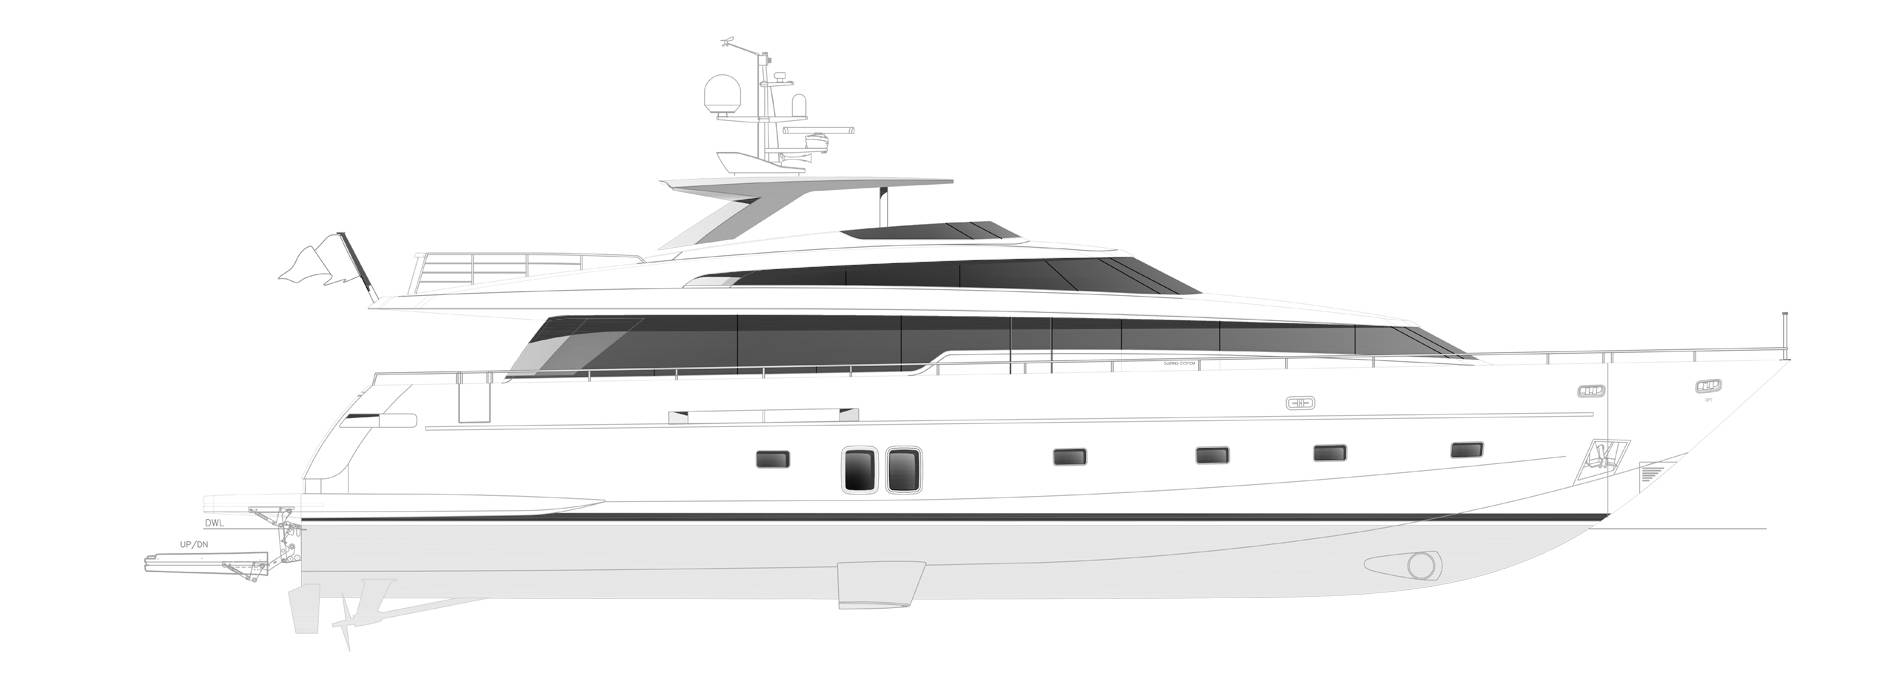 Sanlorenzo Yachts SL96-631 Profilo